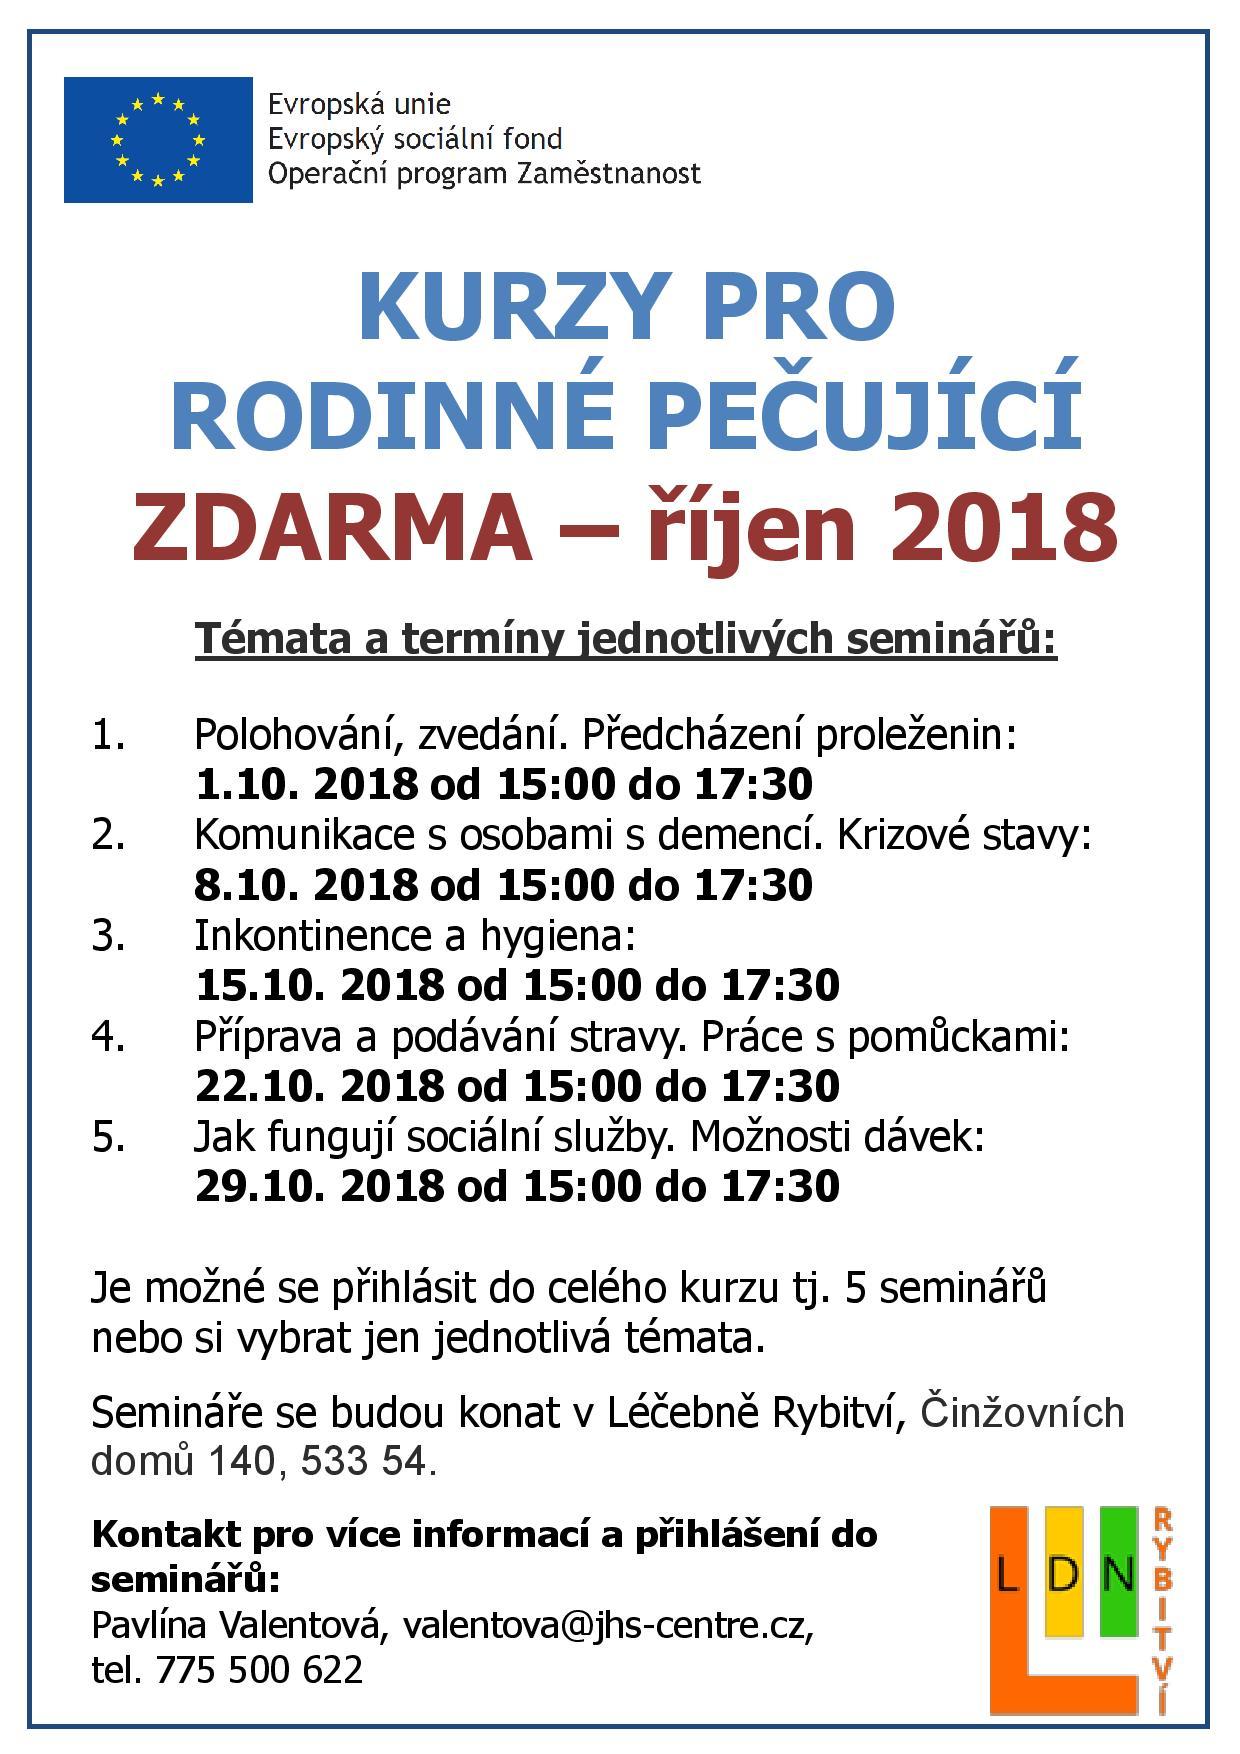 LDN_ Temata kurzů a terminy_rijen 2018_plakat-page-001